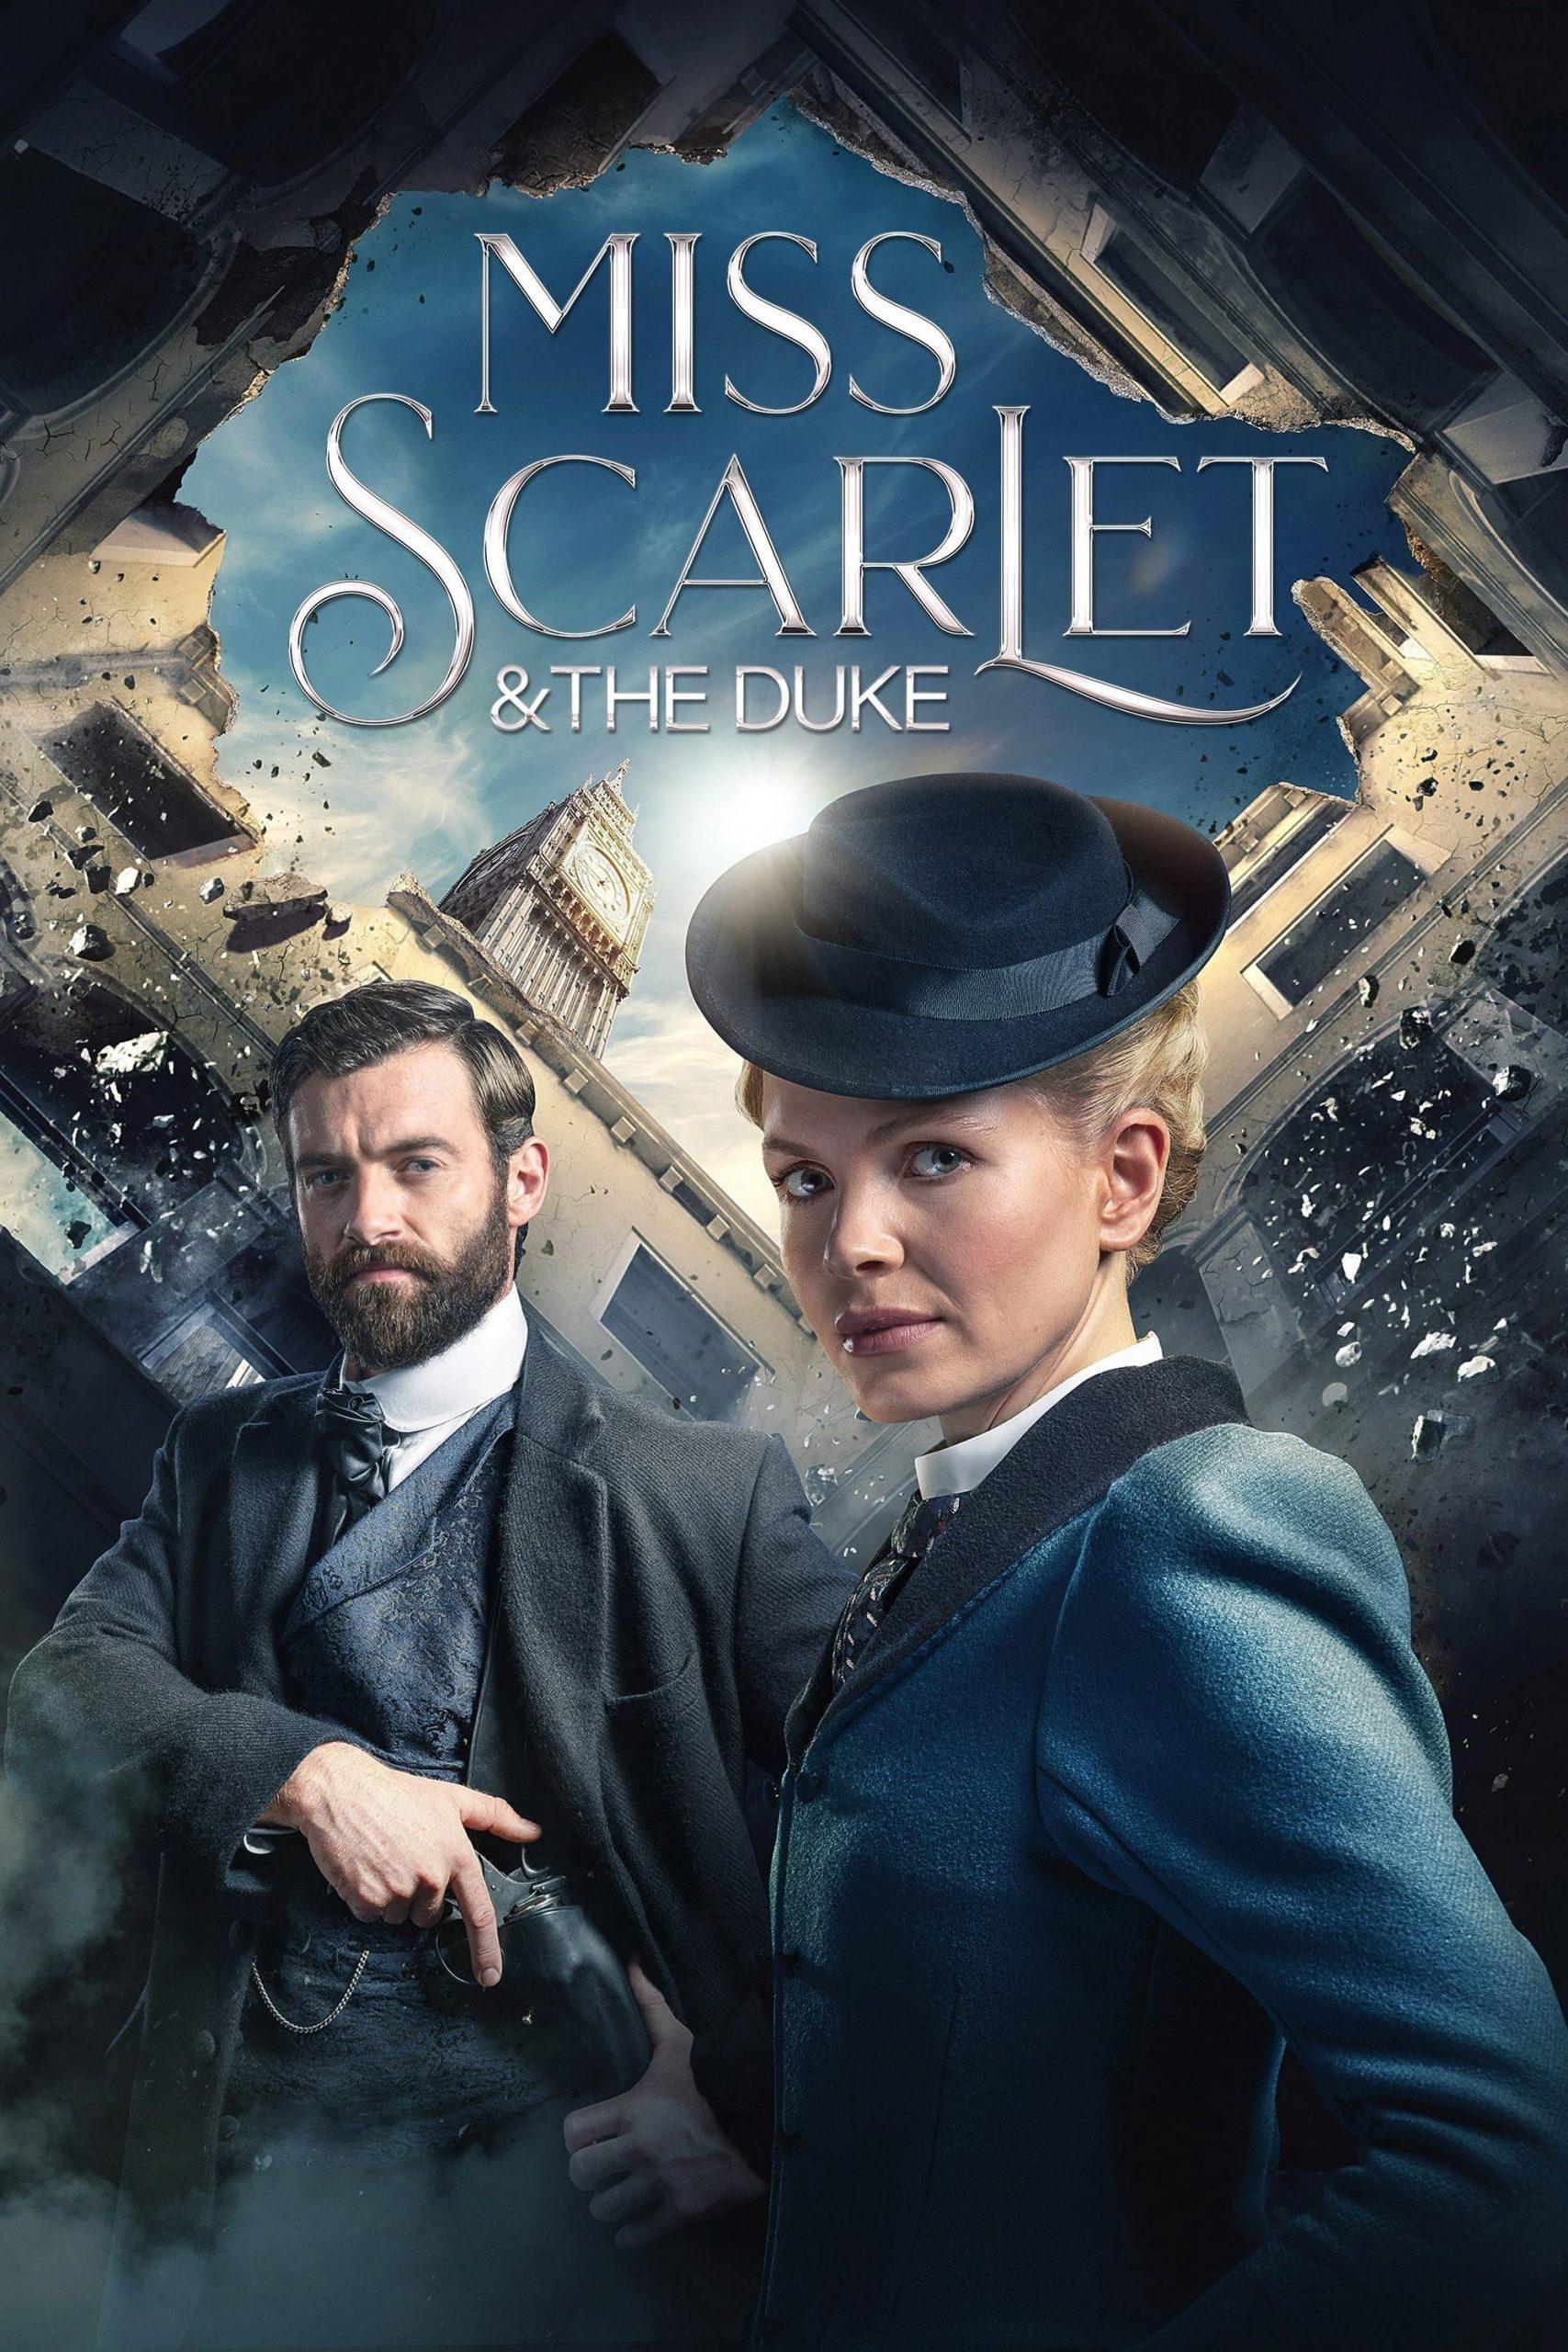 دانلود سریال Miss Scarlet & the Duke